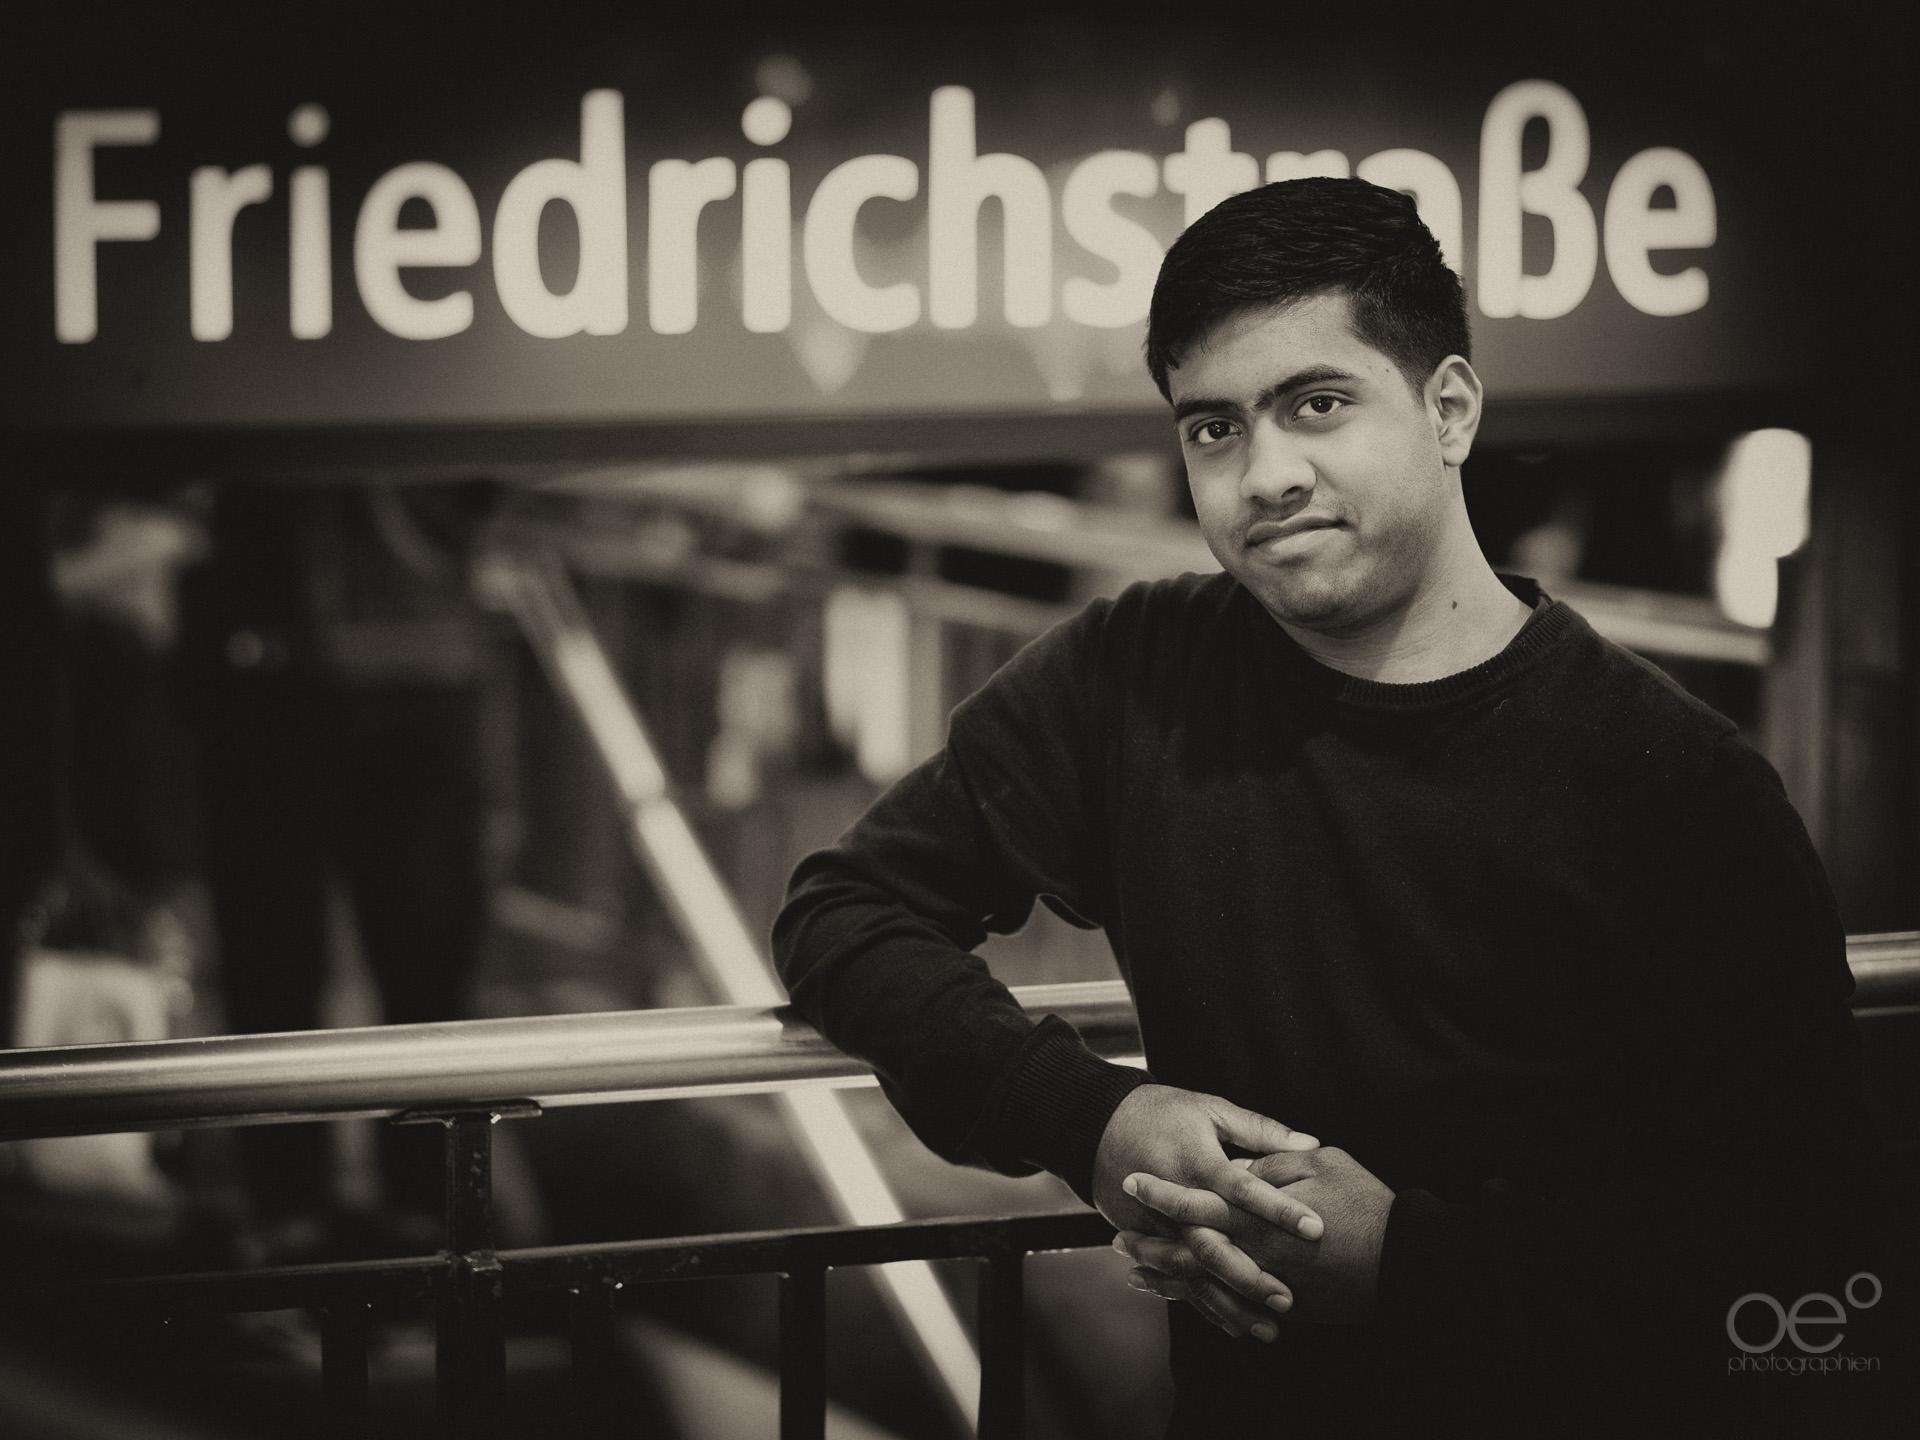 Ort: U Friedrichstrasse, Berlin